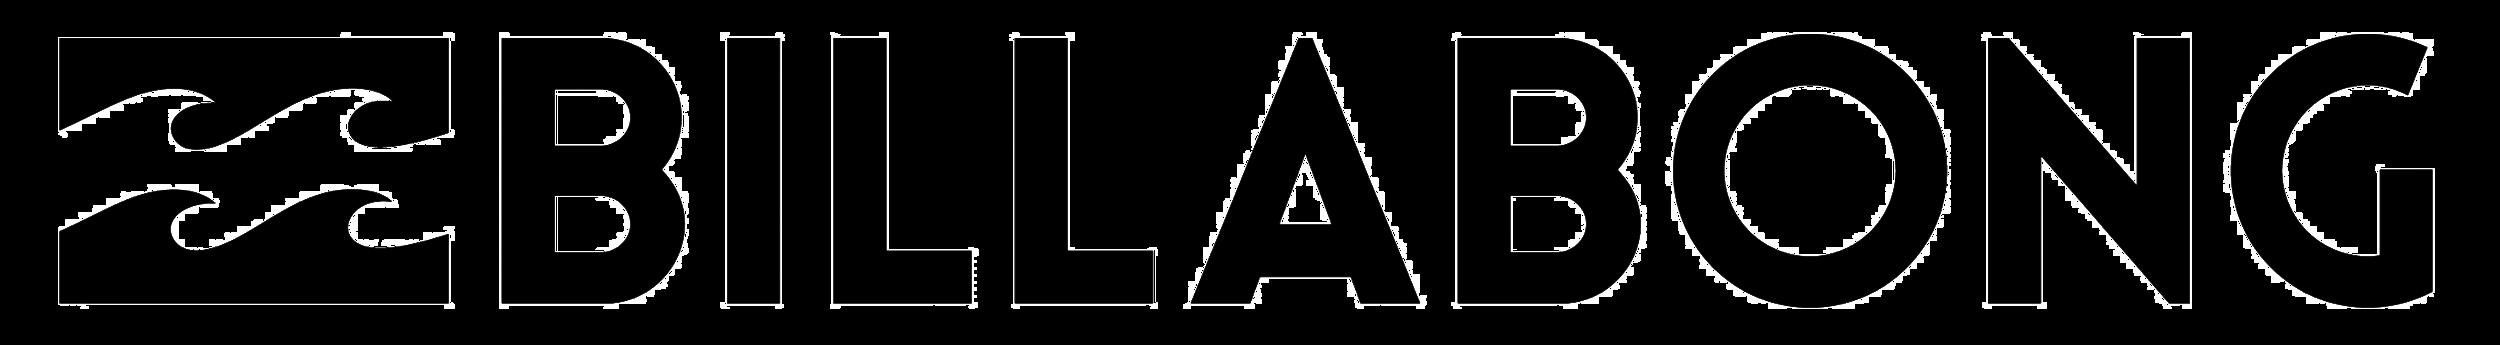 Billabong_logo.png